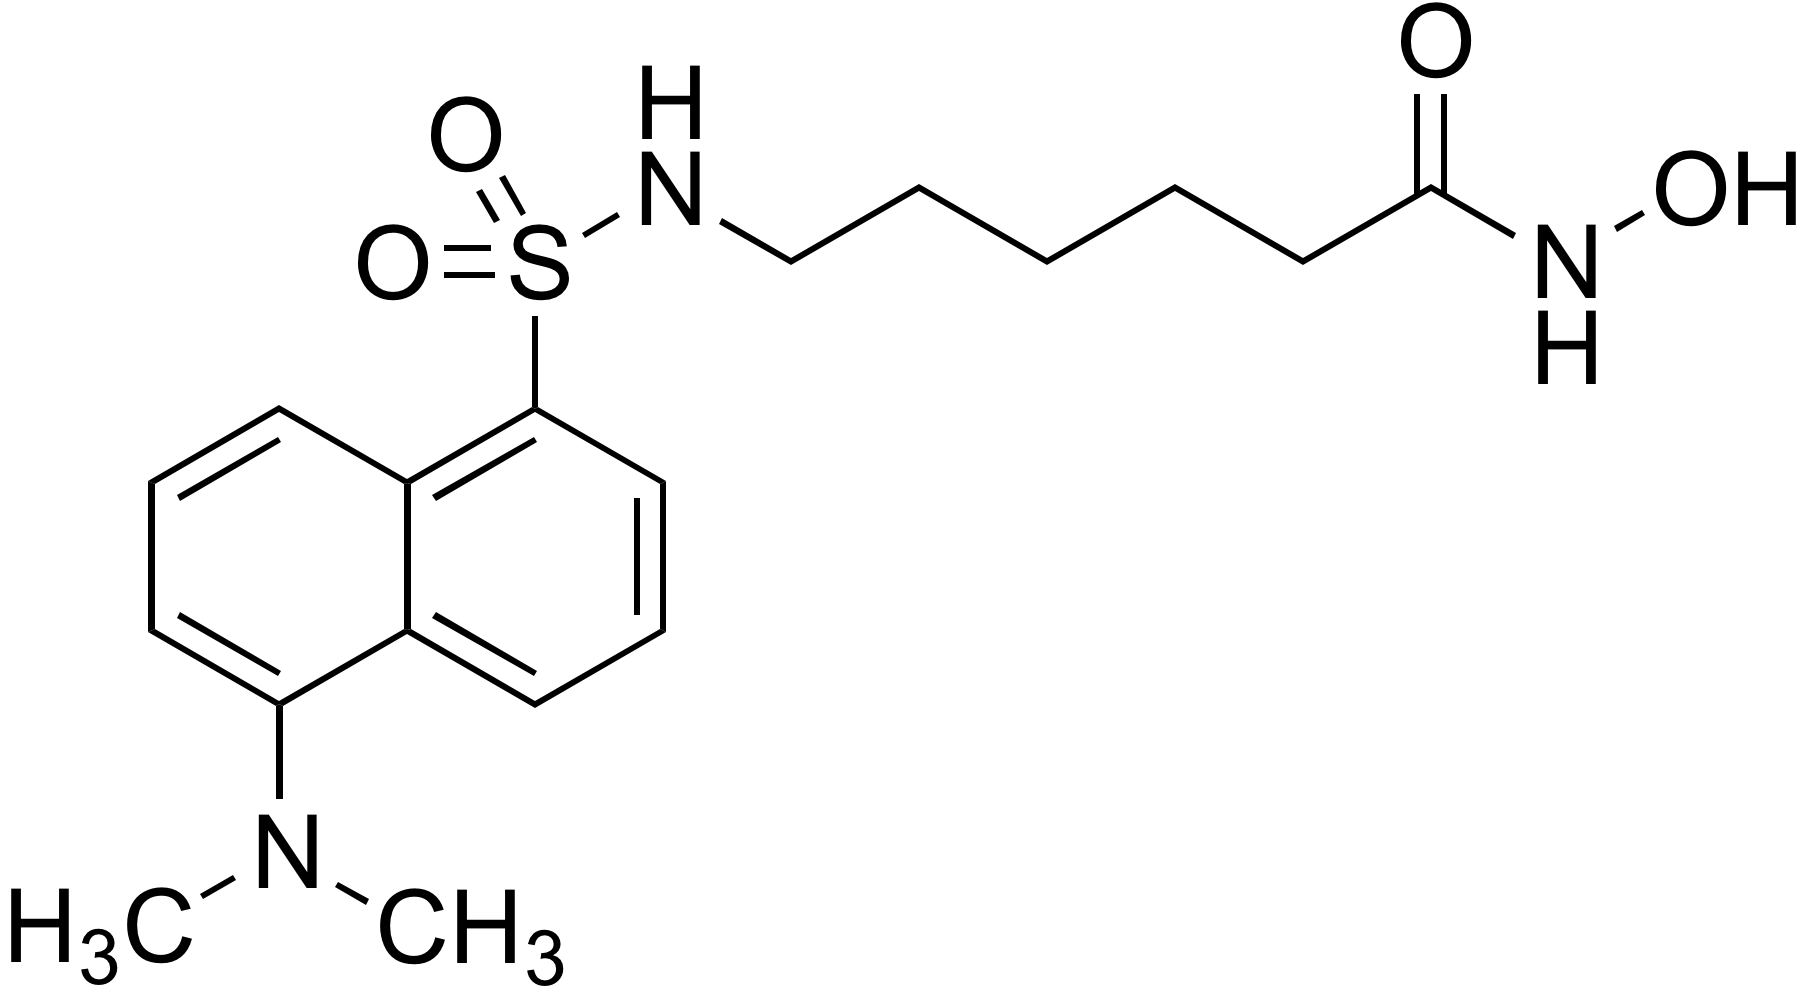 6-Dansyl-N-hydroxyhexanamide